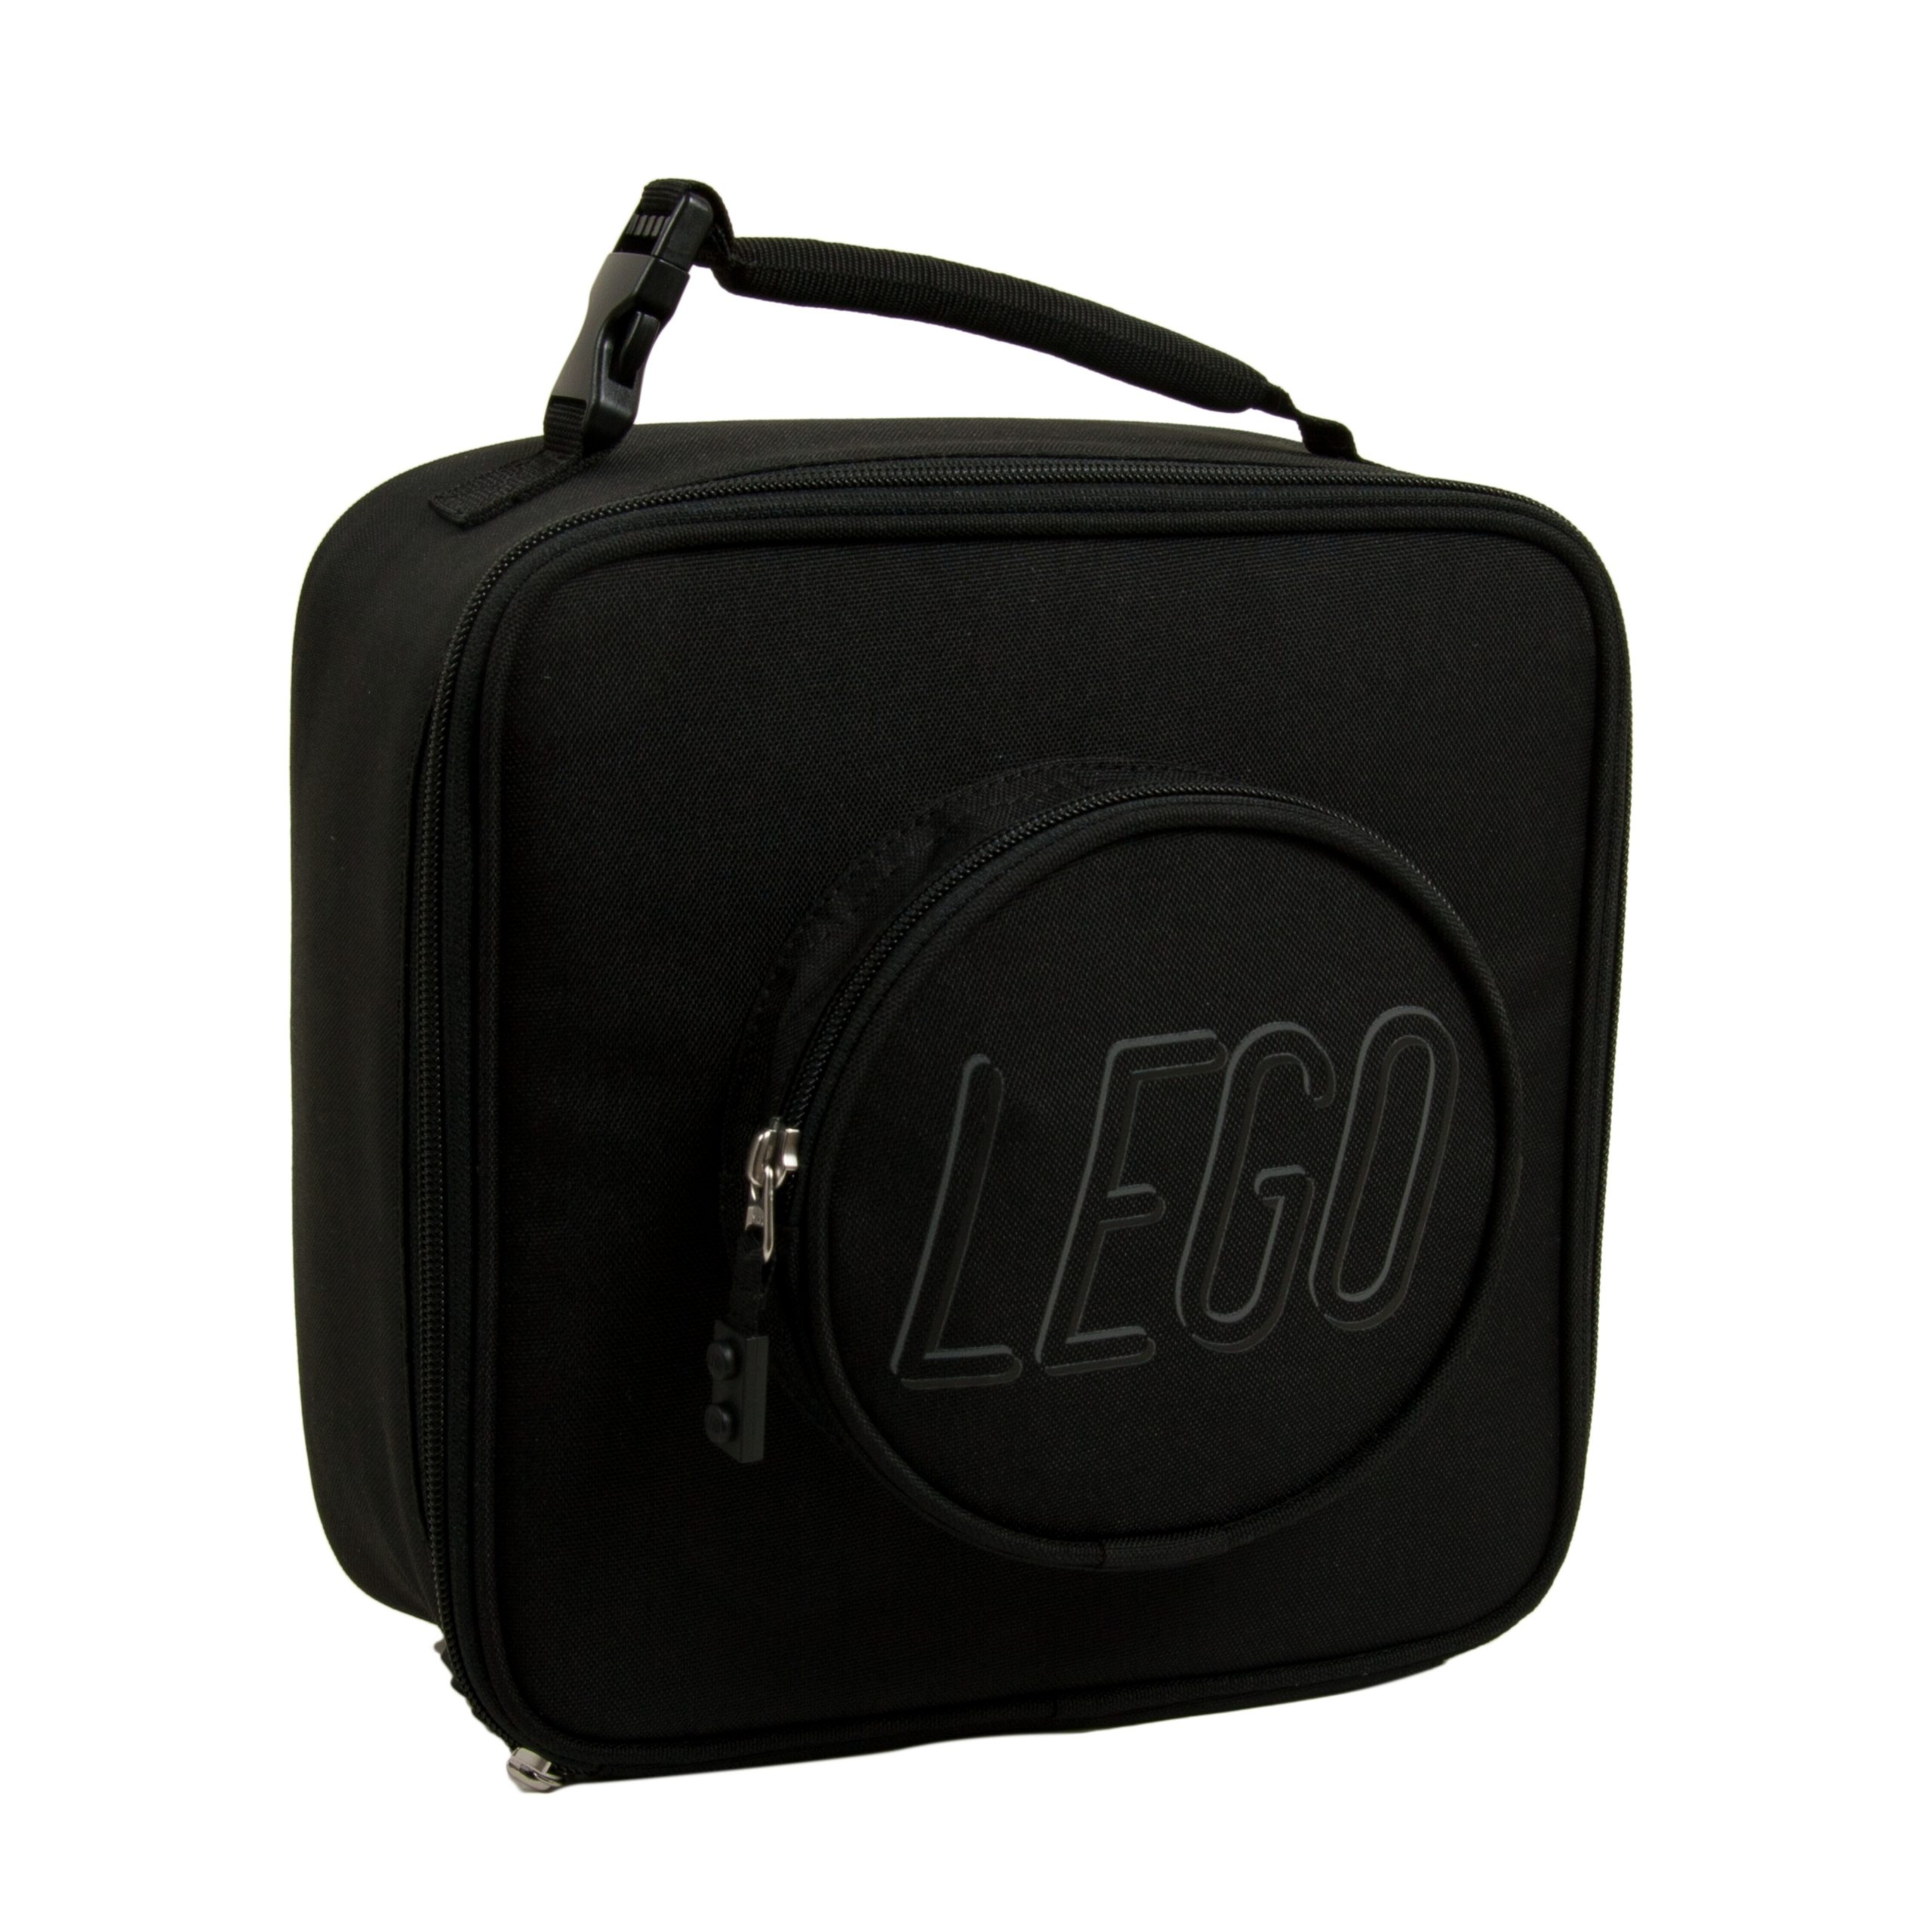 lego 5005533 brick lunch bag black scaled